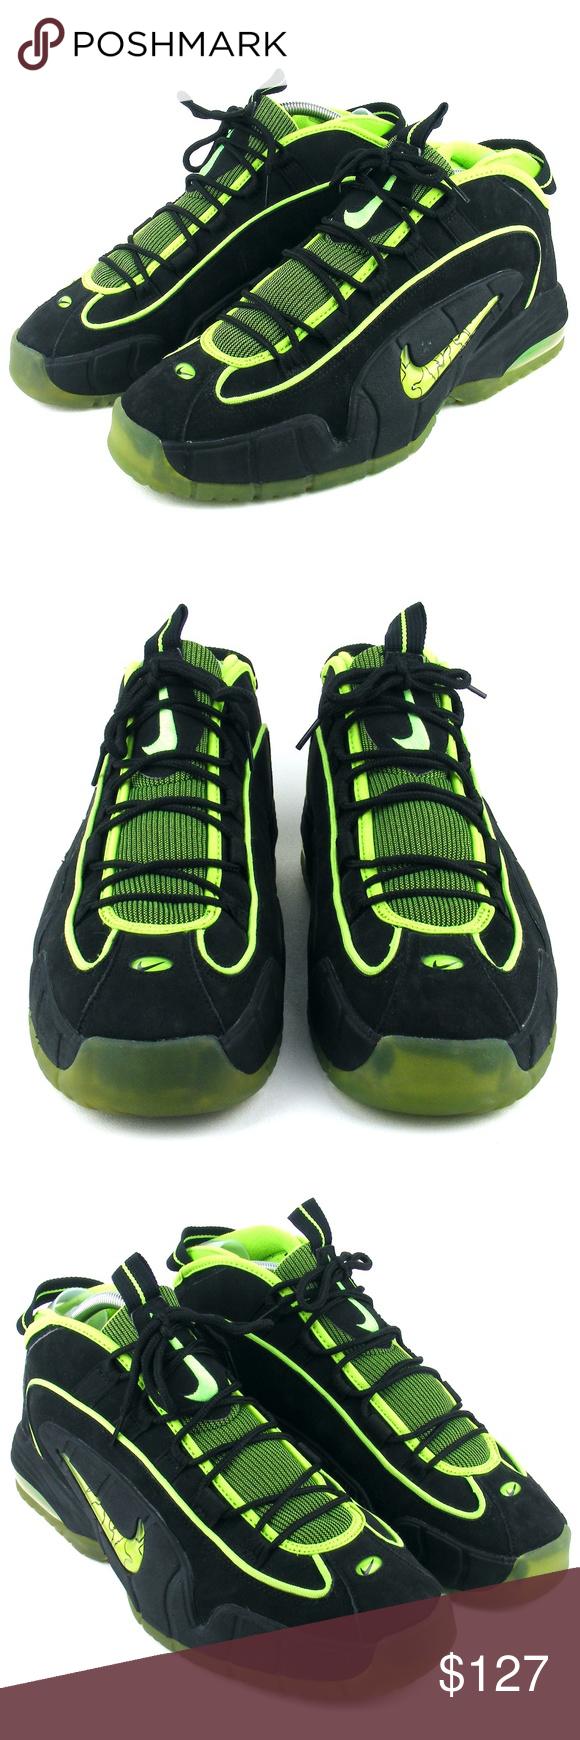 super popular dcbd9 02b15 Nike Air Max Penny 1 Highlighter Pack (2011)438793 Nike Air Max Penny 1